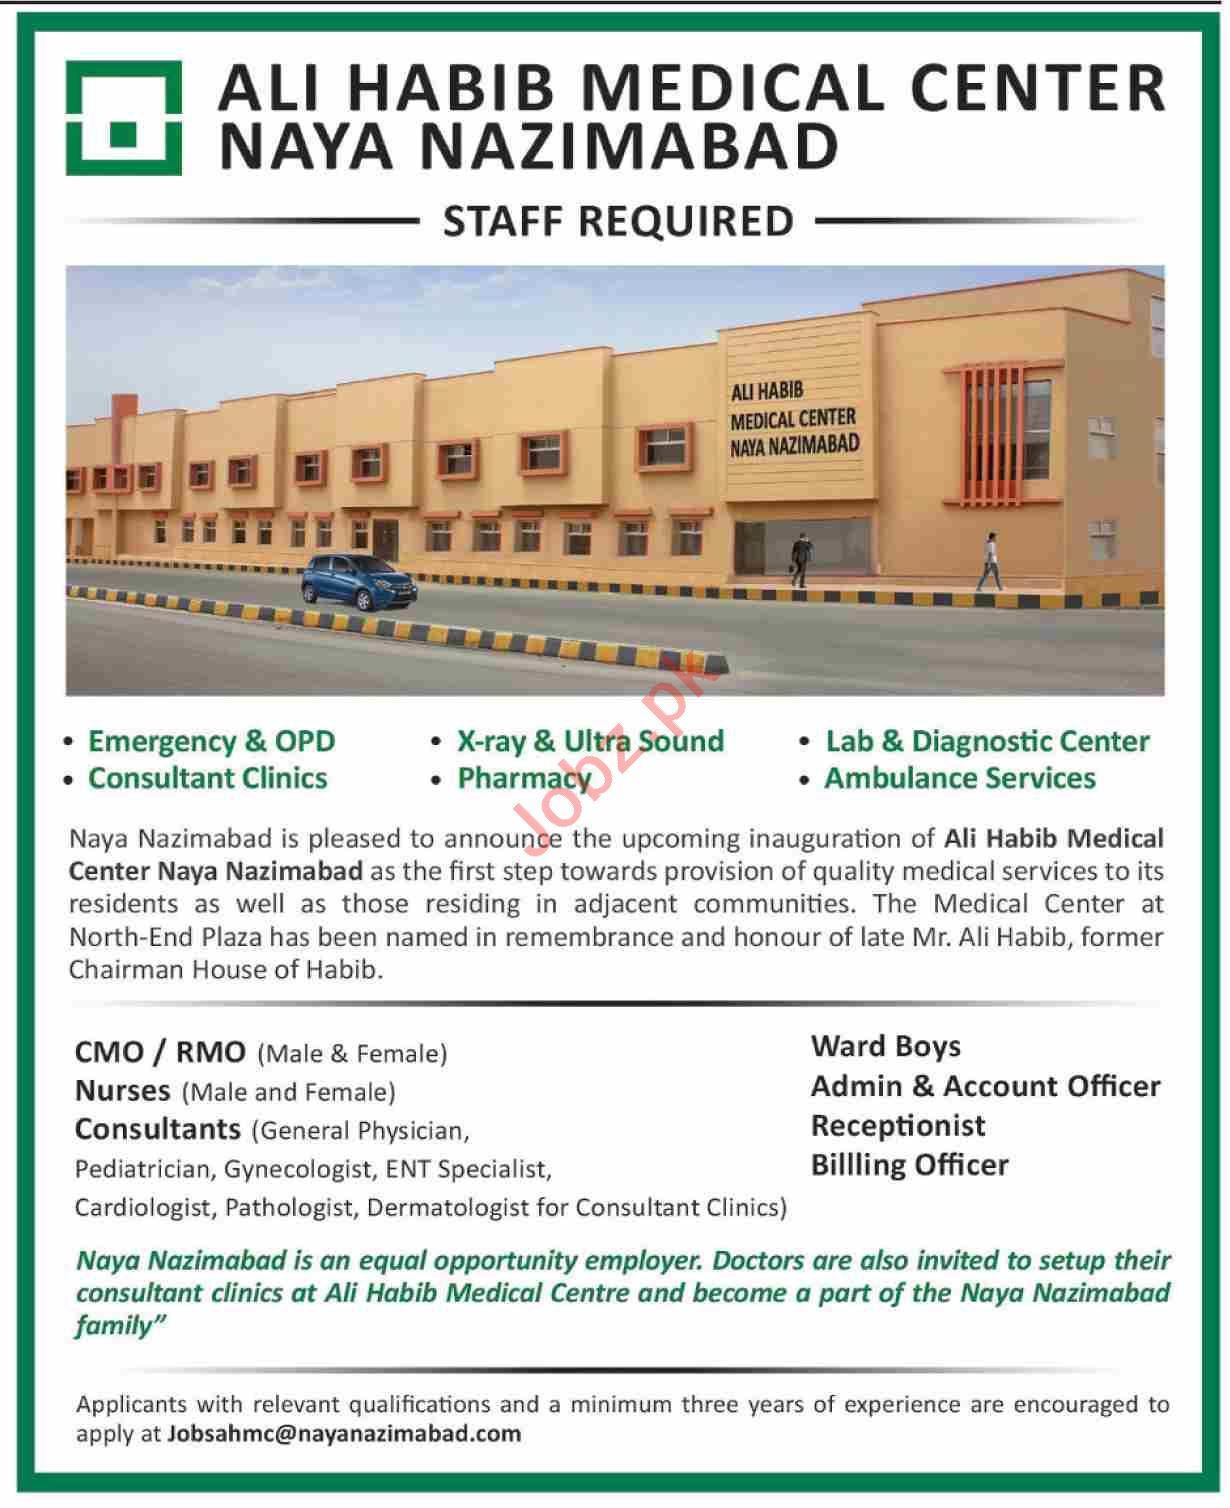 Ali Habib Medical Center Naya Nazimabad Karachi Jobs 2020